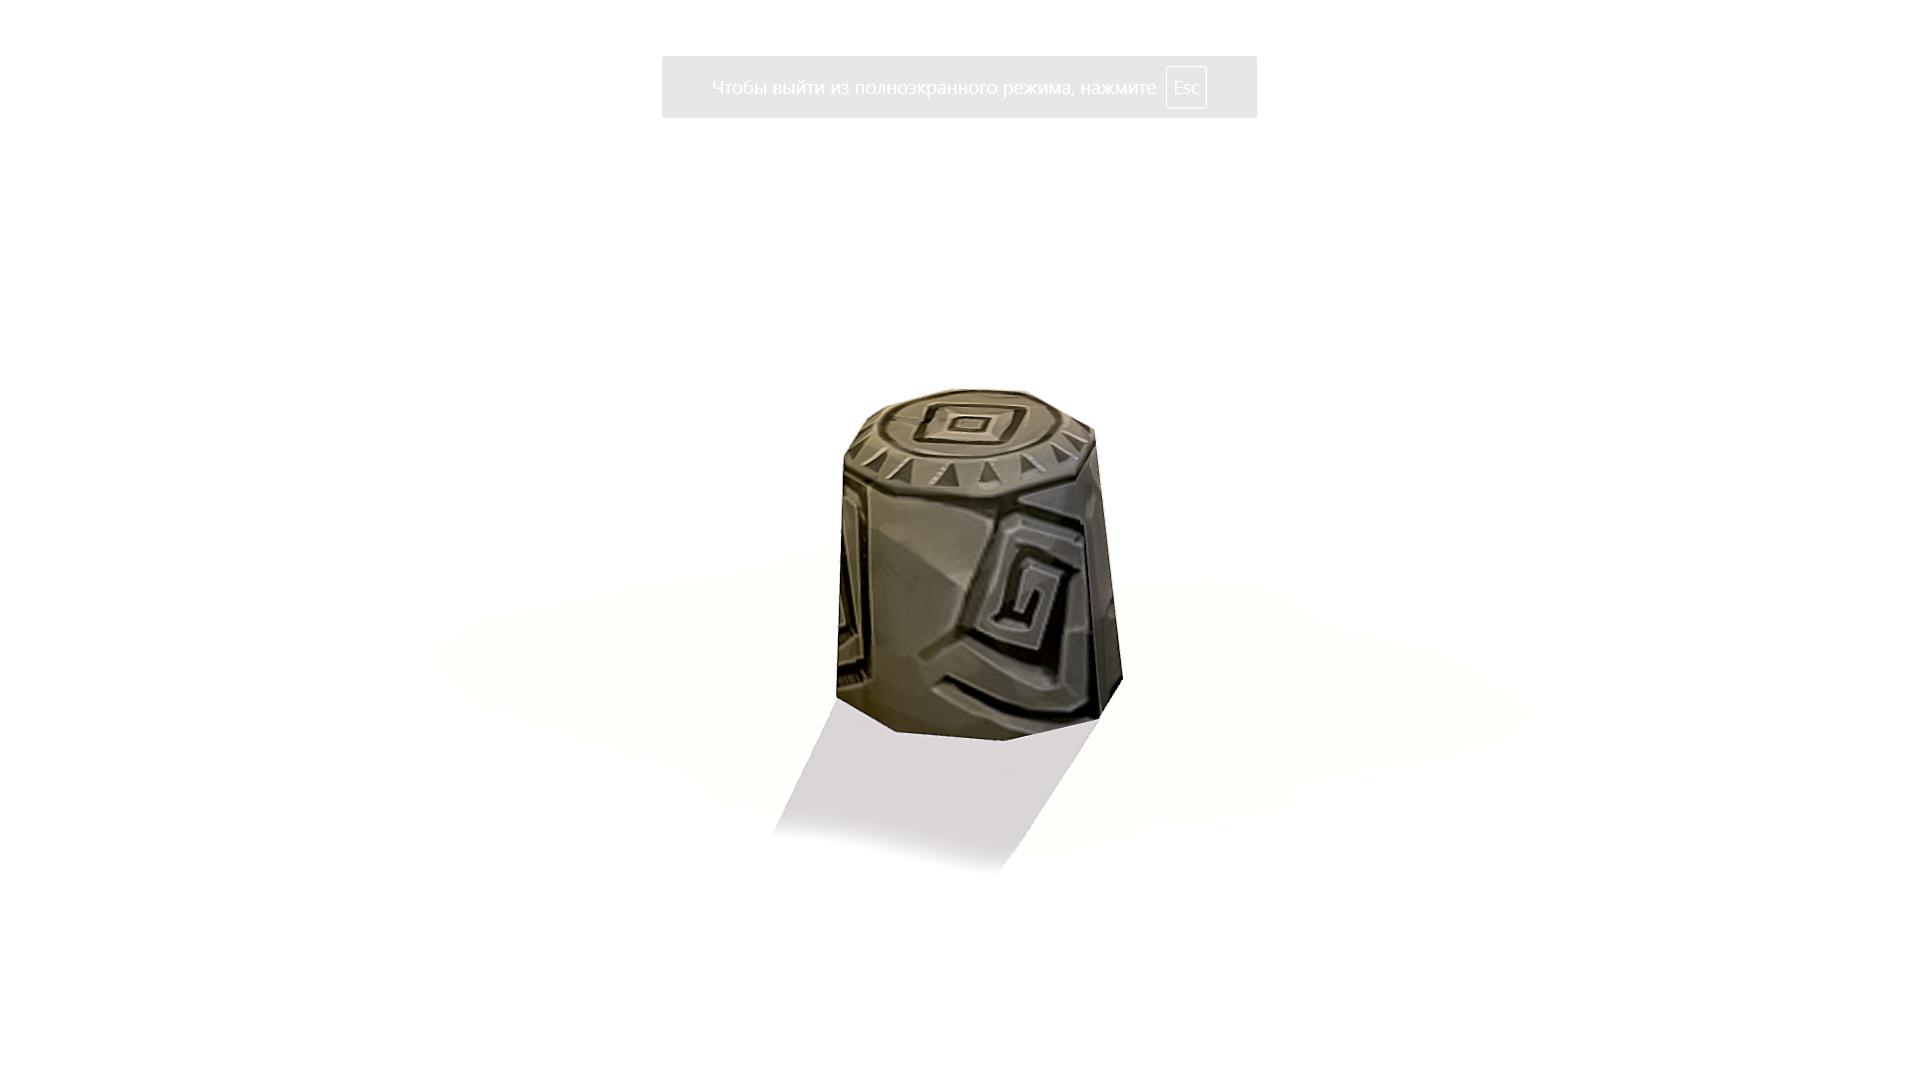 Handpaint Cartoon Stone Memorial Totem 04 Symbol